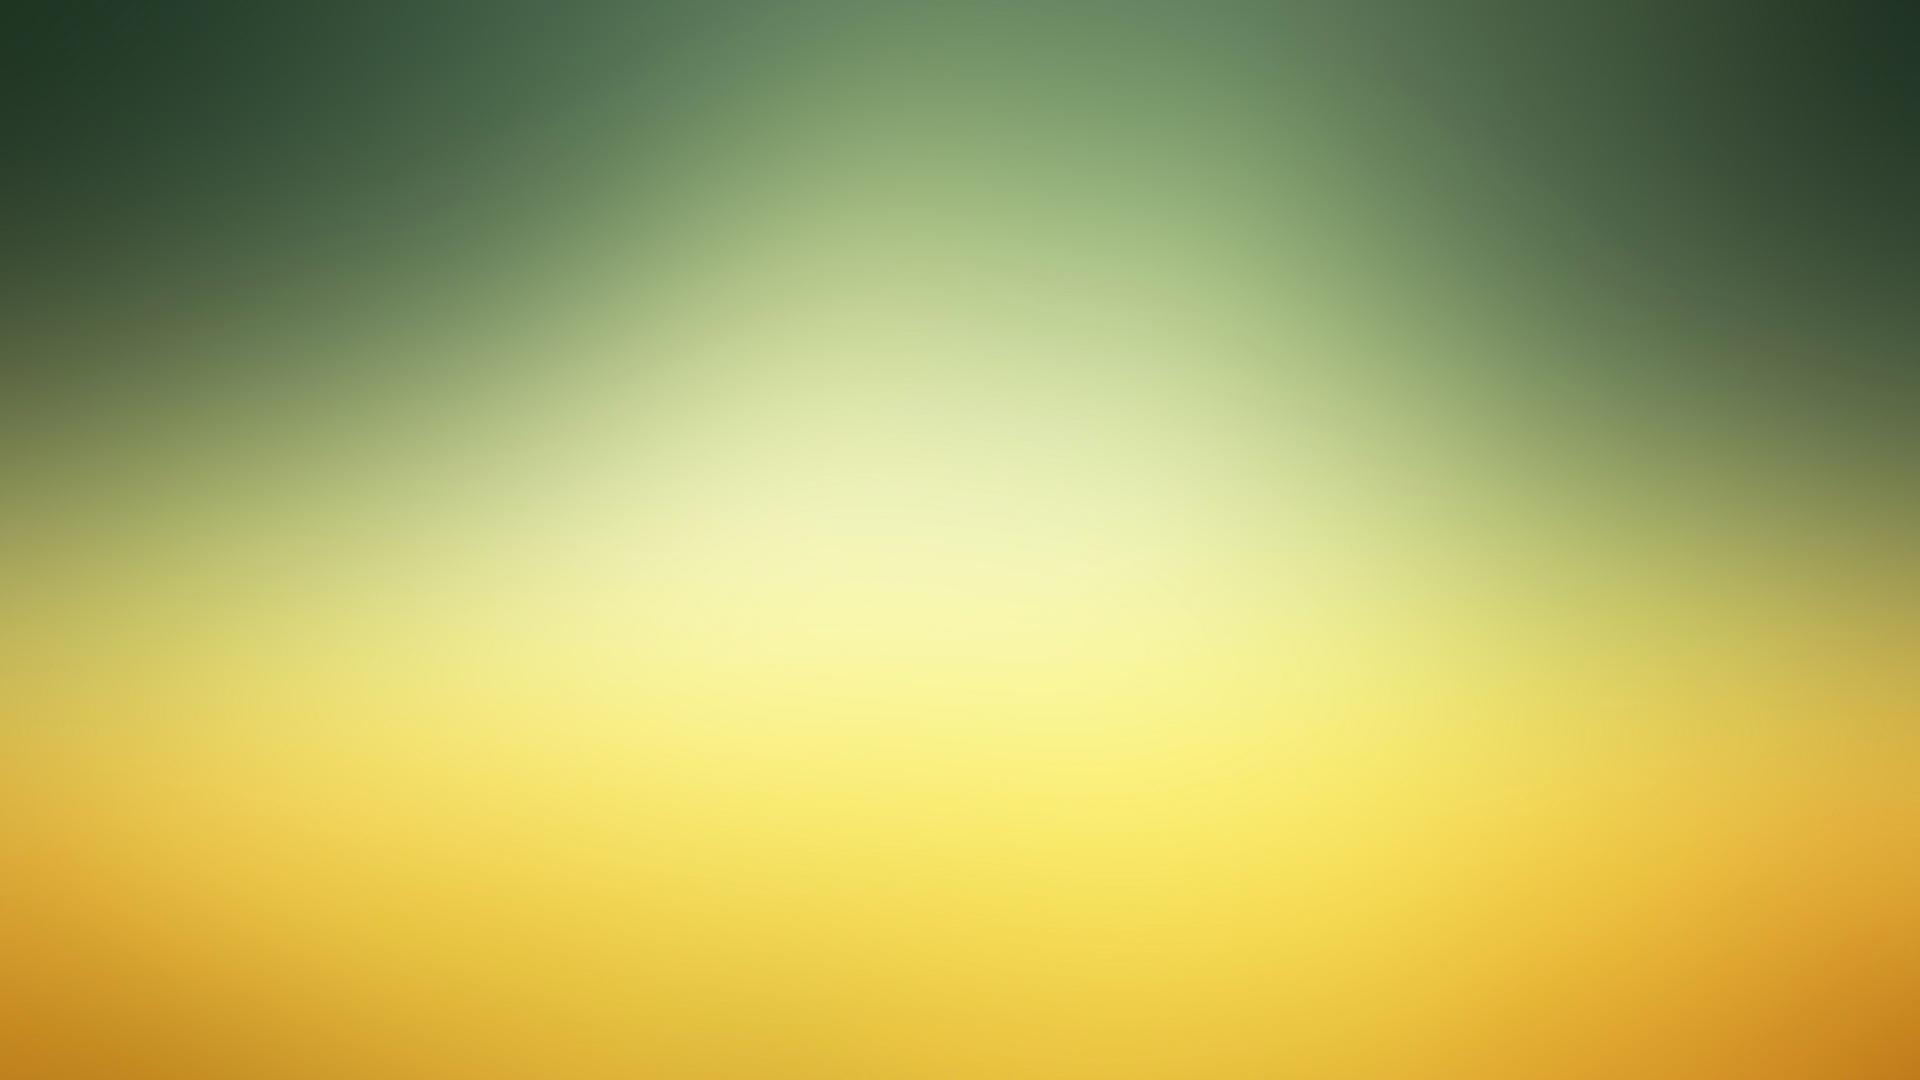 Gradient-Wallpaper-Free